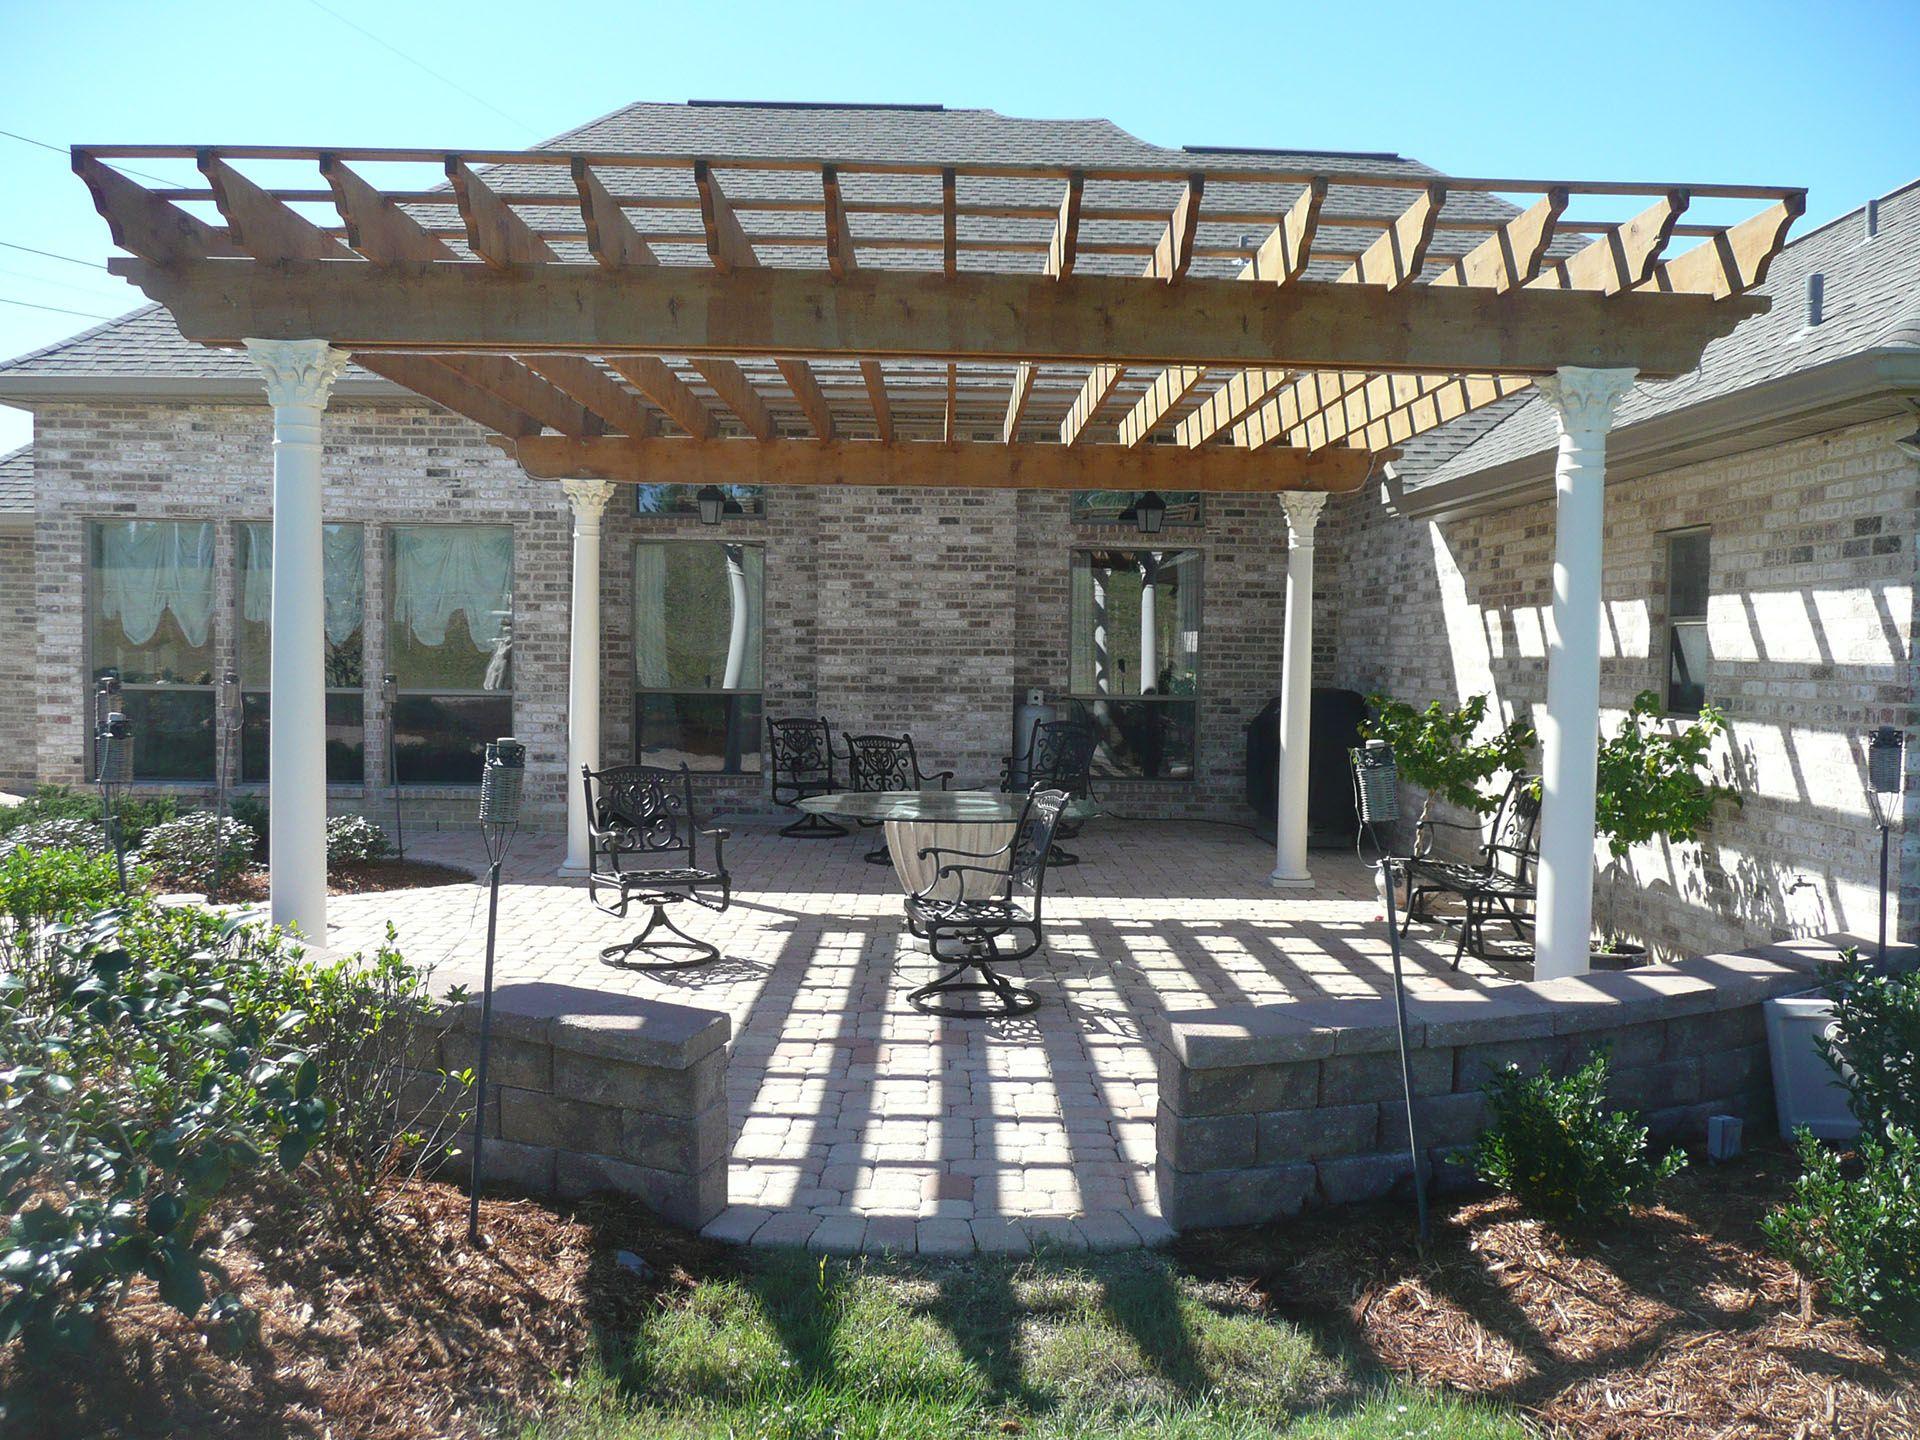 Outdoor Pergola Designs Professional Hardscape And Landscape 3d Design Software Bbb Rating A Pergola Pergola Designs Outdoor Pergola